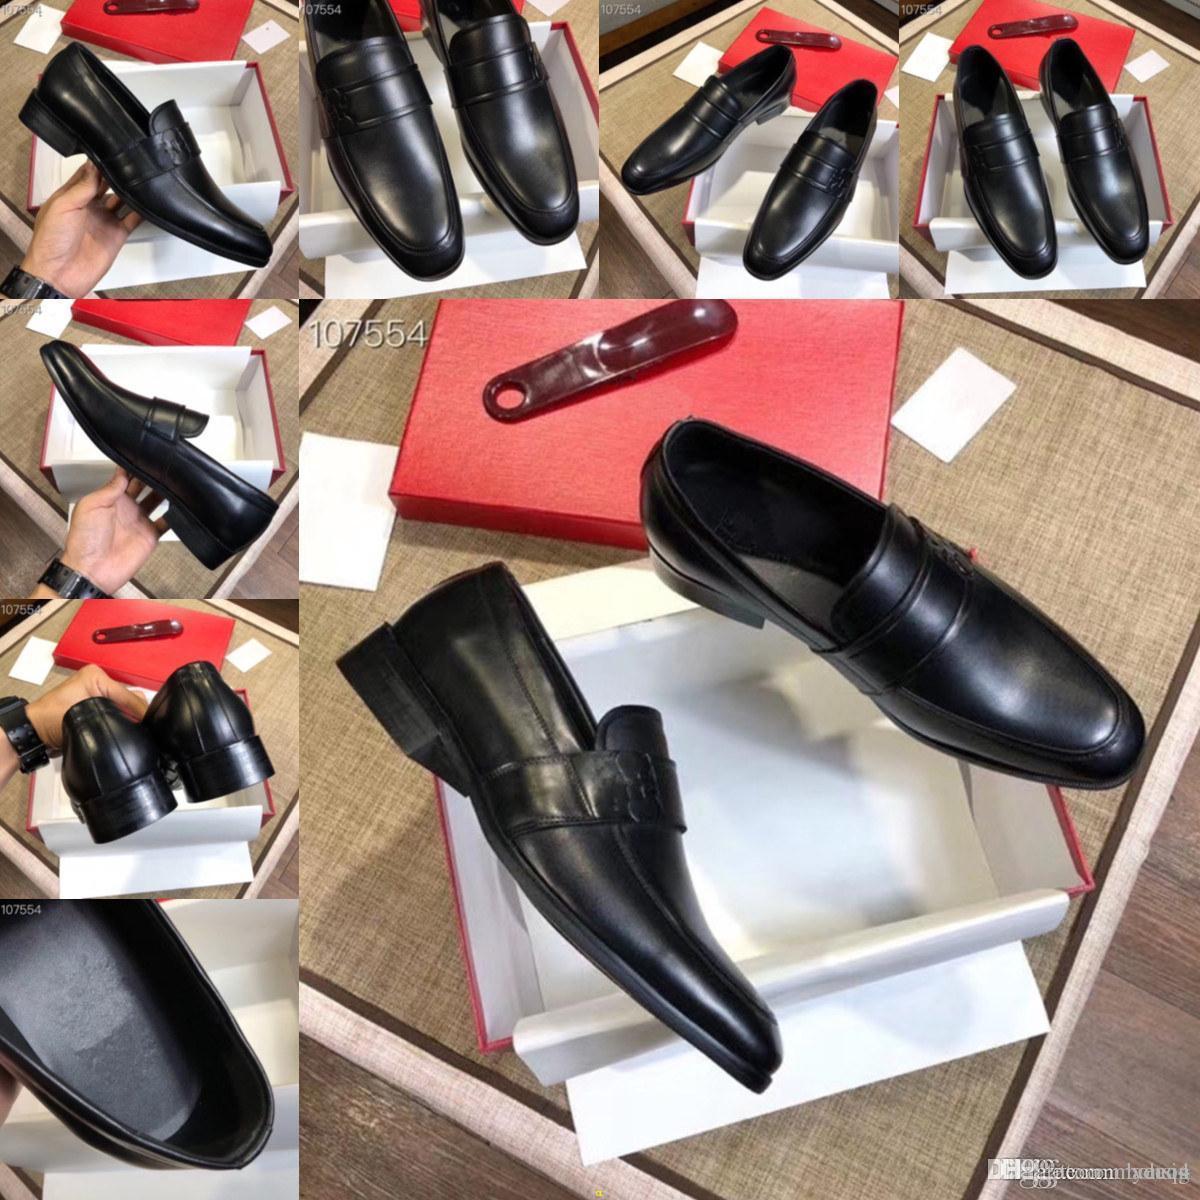 MM Marques de luxe Top Cuir Mode Hommes Business Robe Mocassins pointus Toe Chaussures Noir Oxford Respirant Formel Chaussures de mariage 33